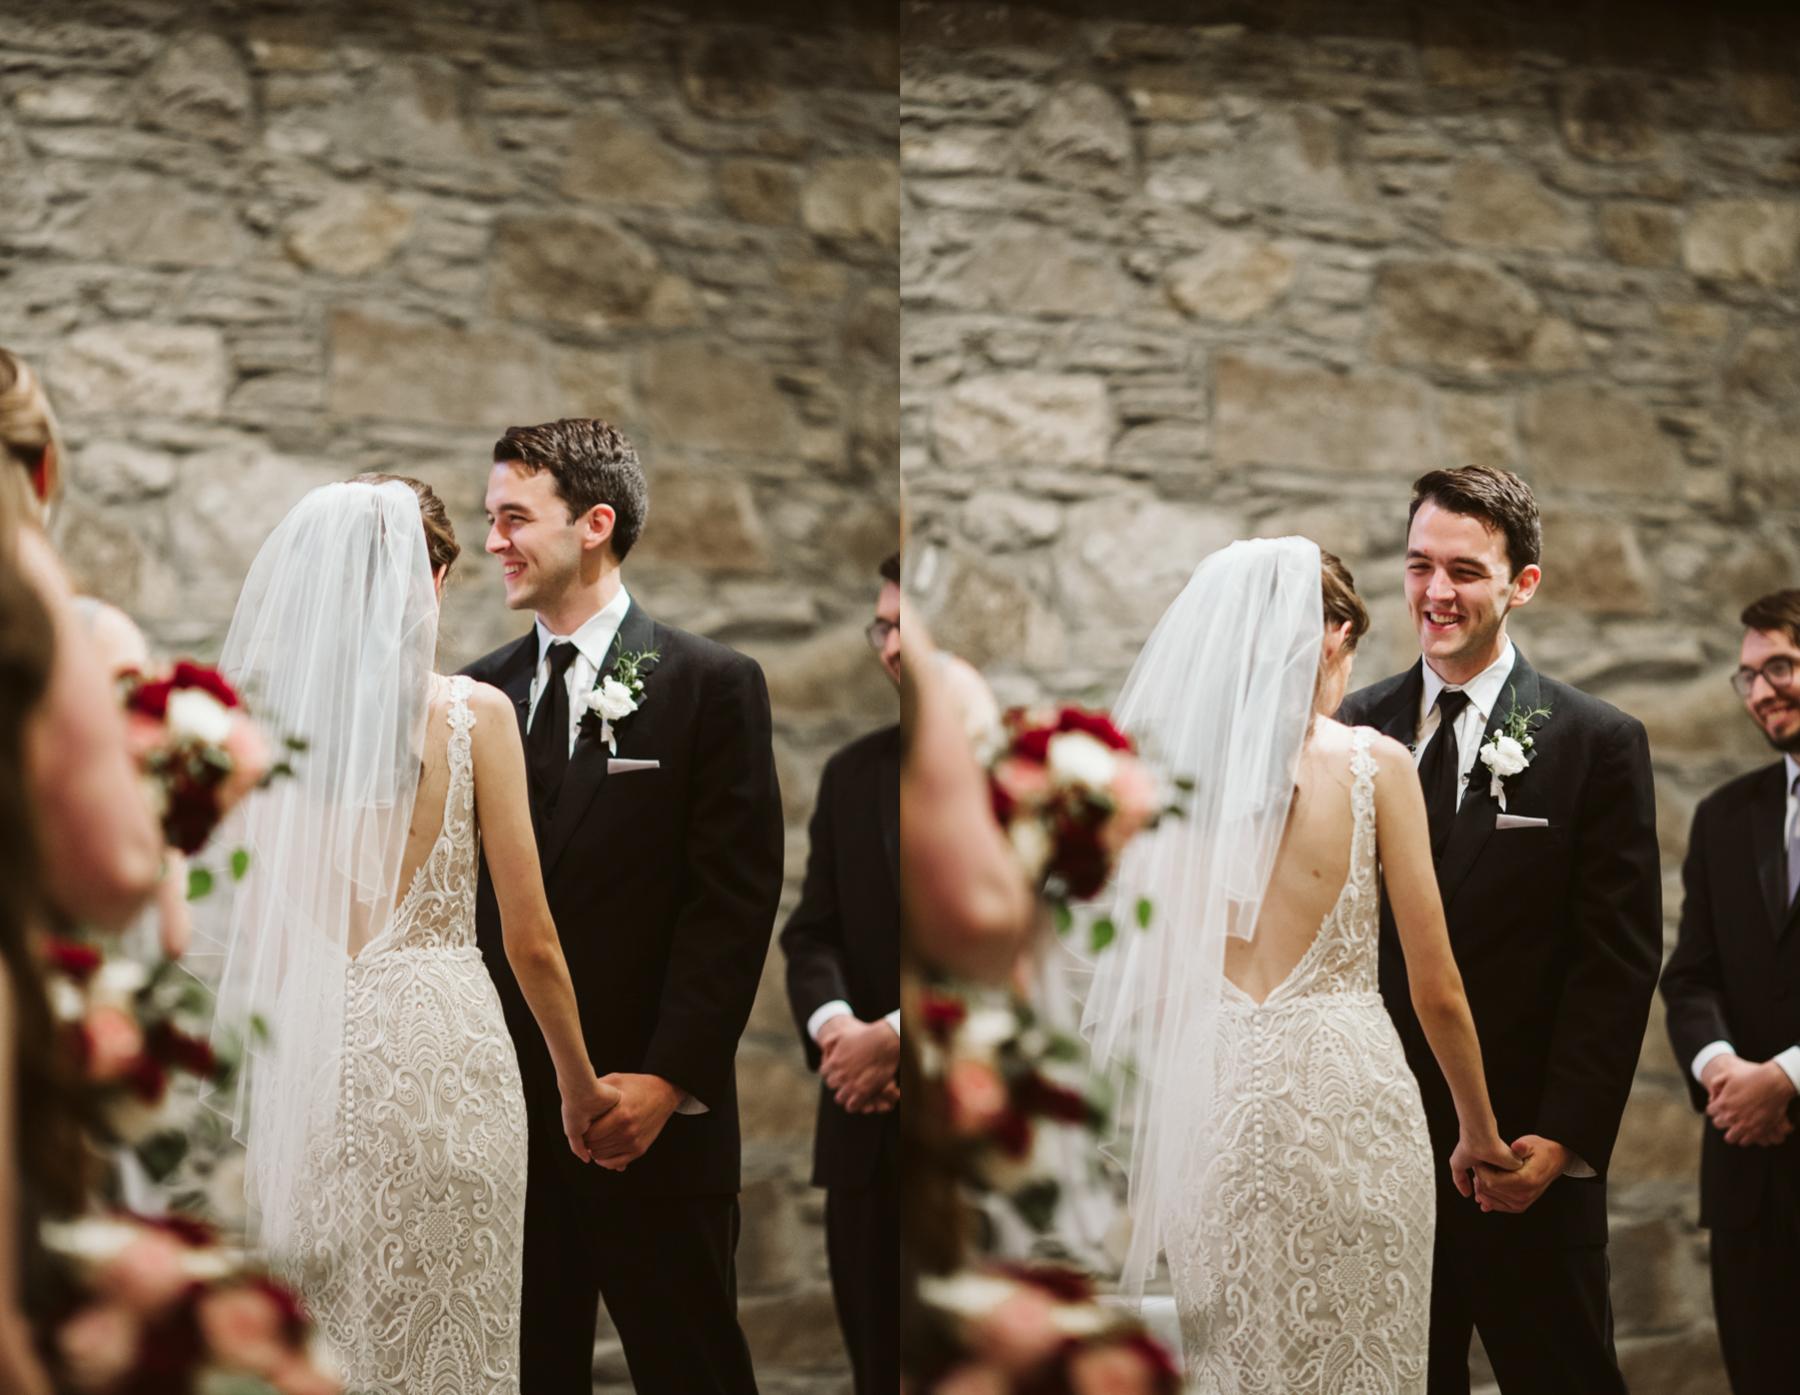 brentwood-hills-church-wedding-2.jpg